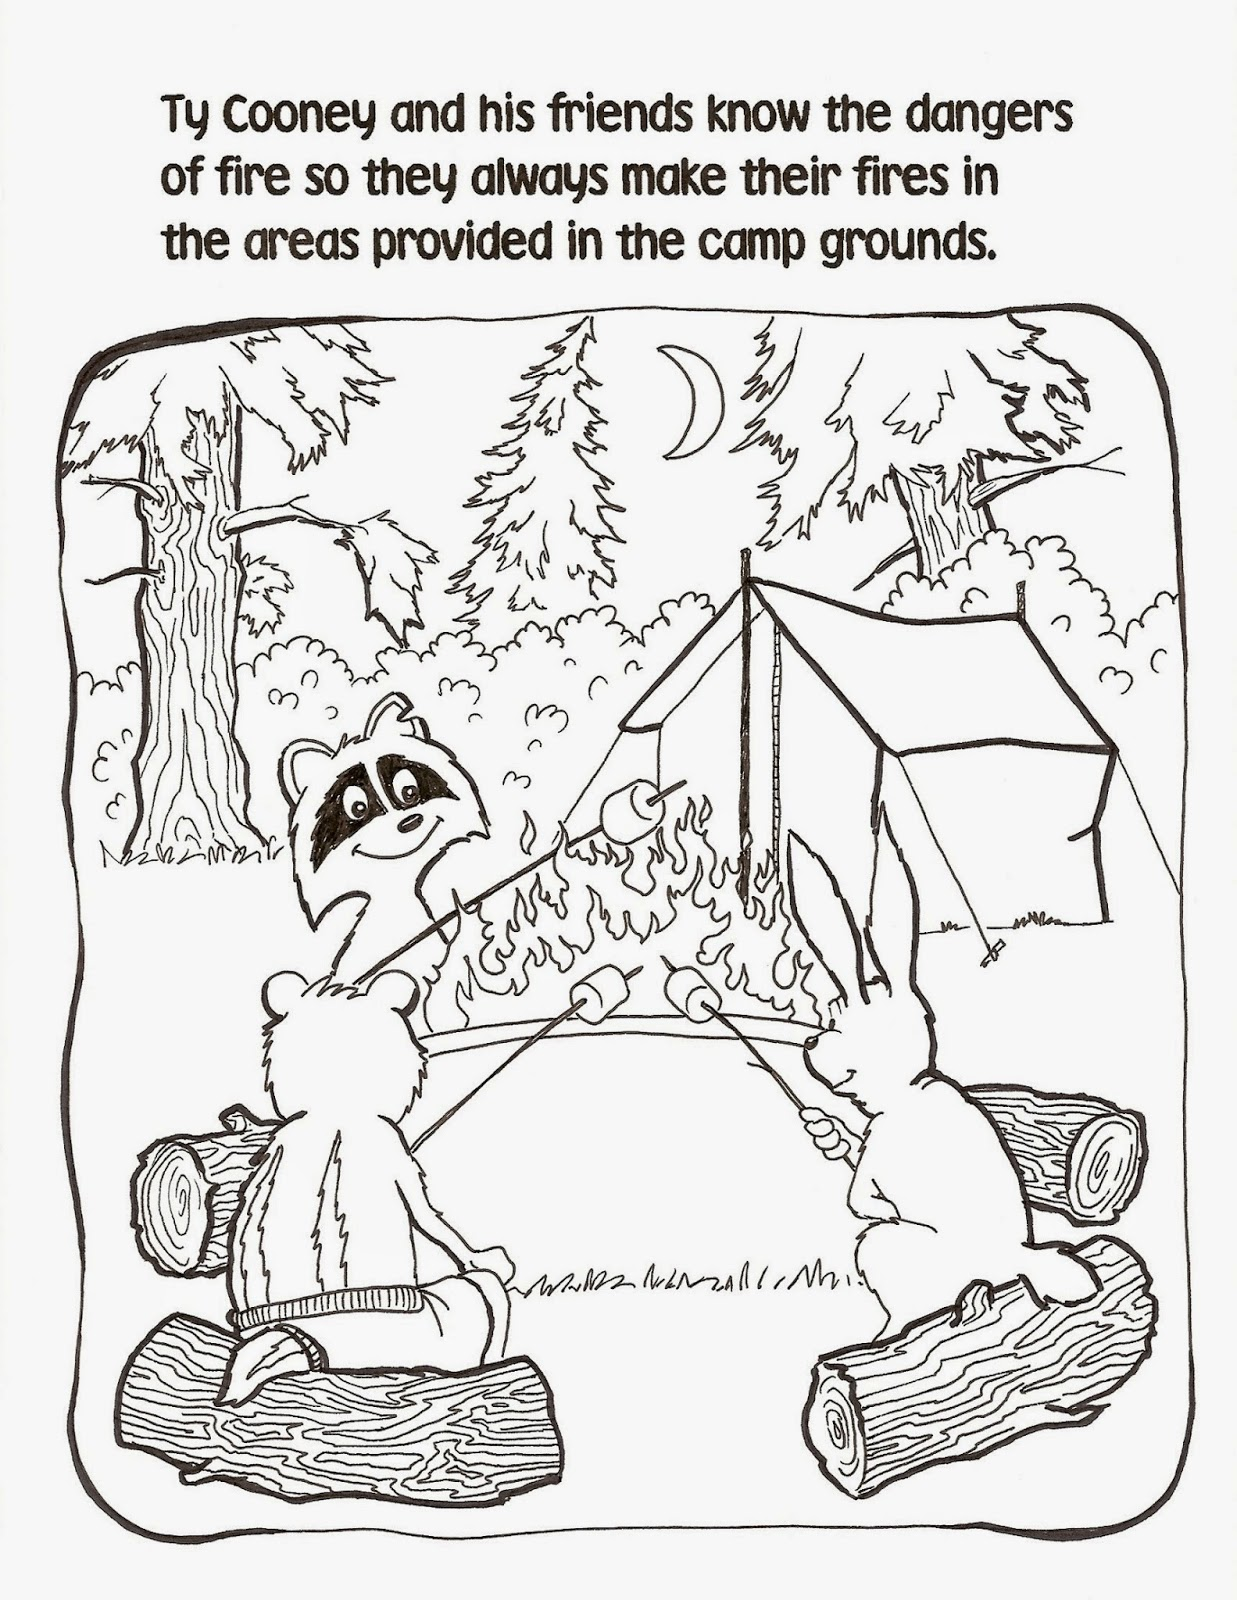 Emerson Villela Carvalho Jr M D Campfire Precautions